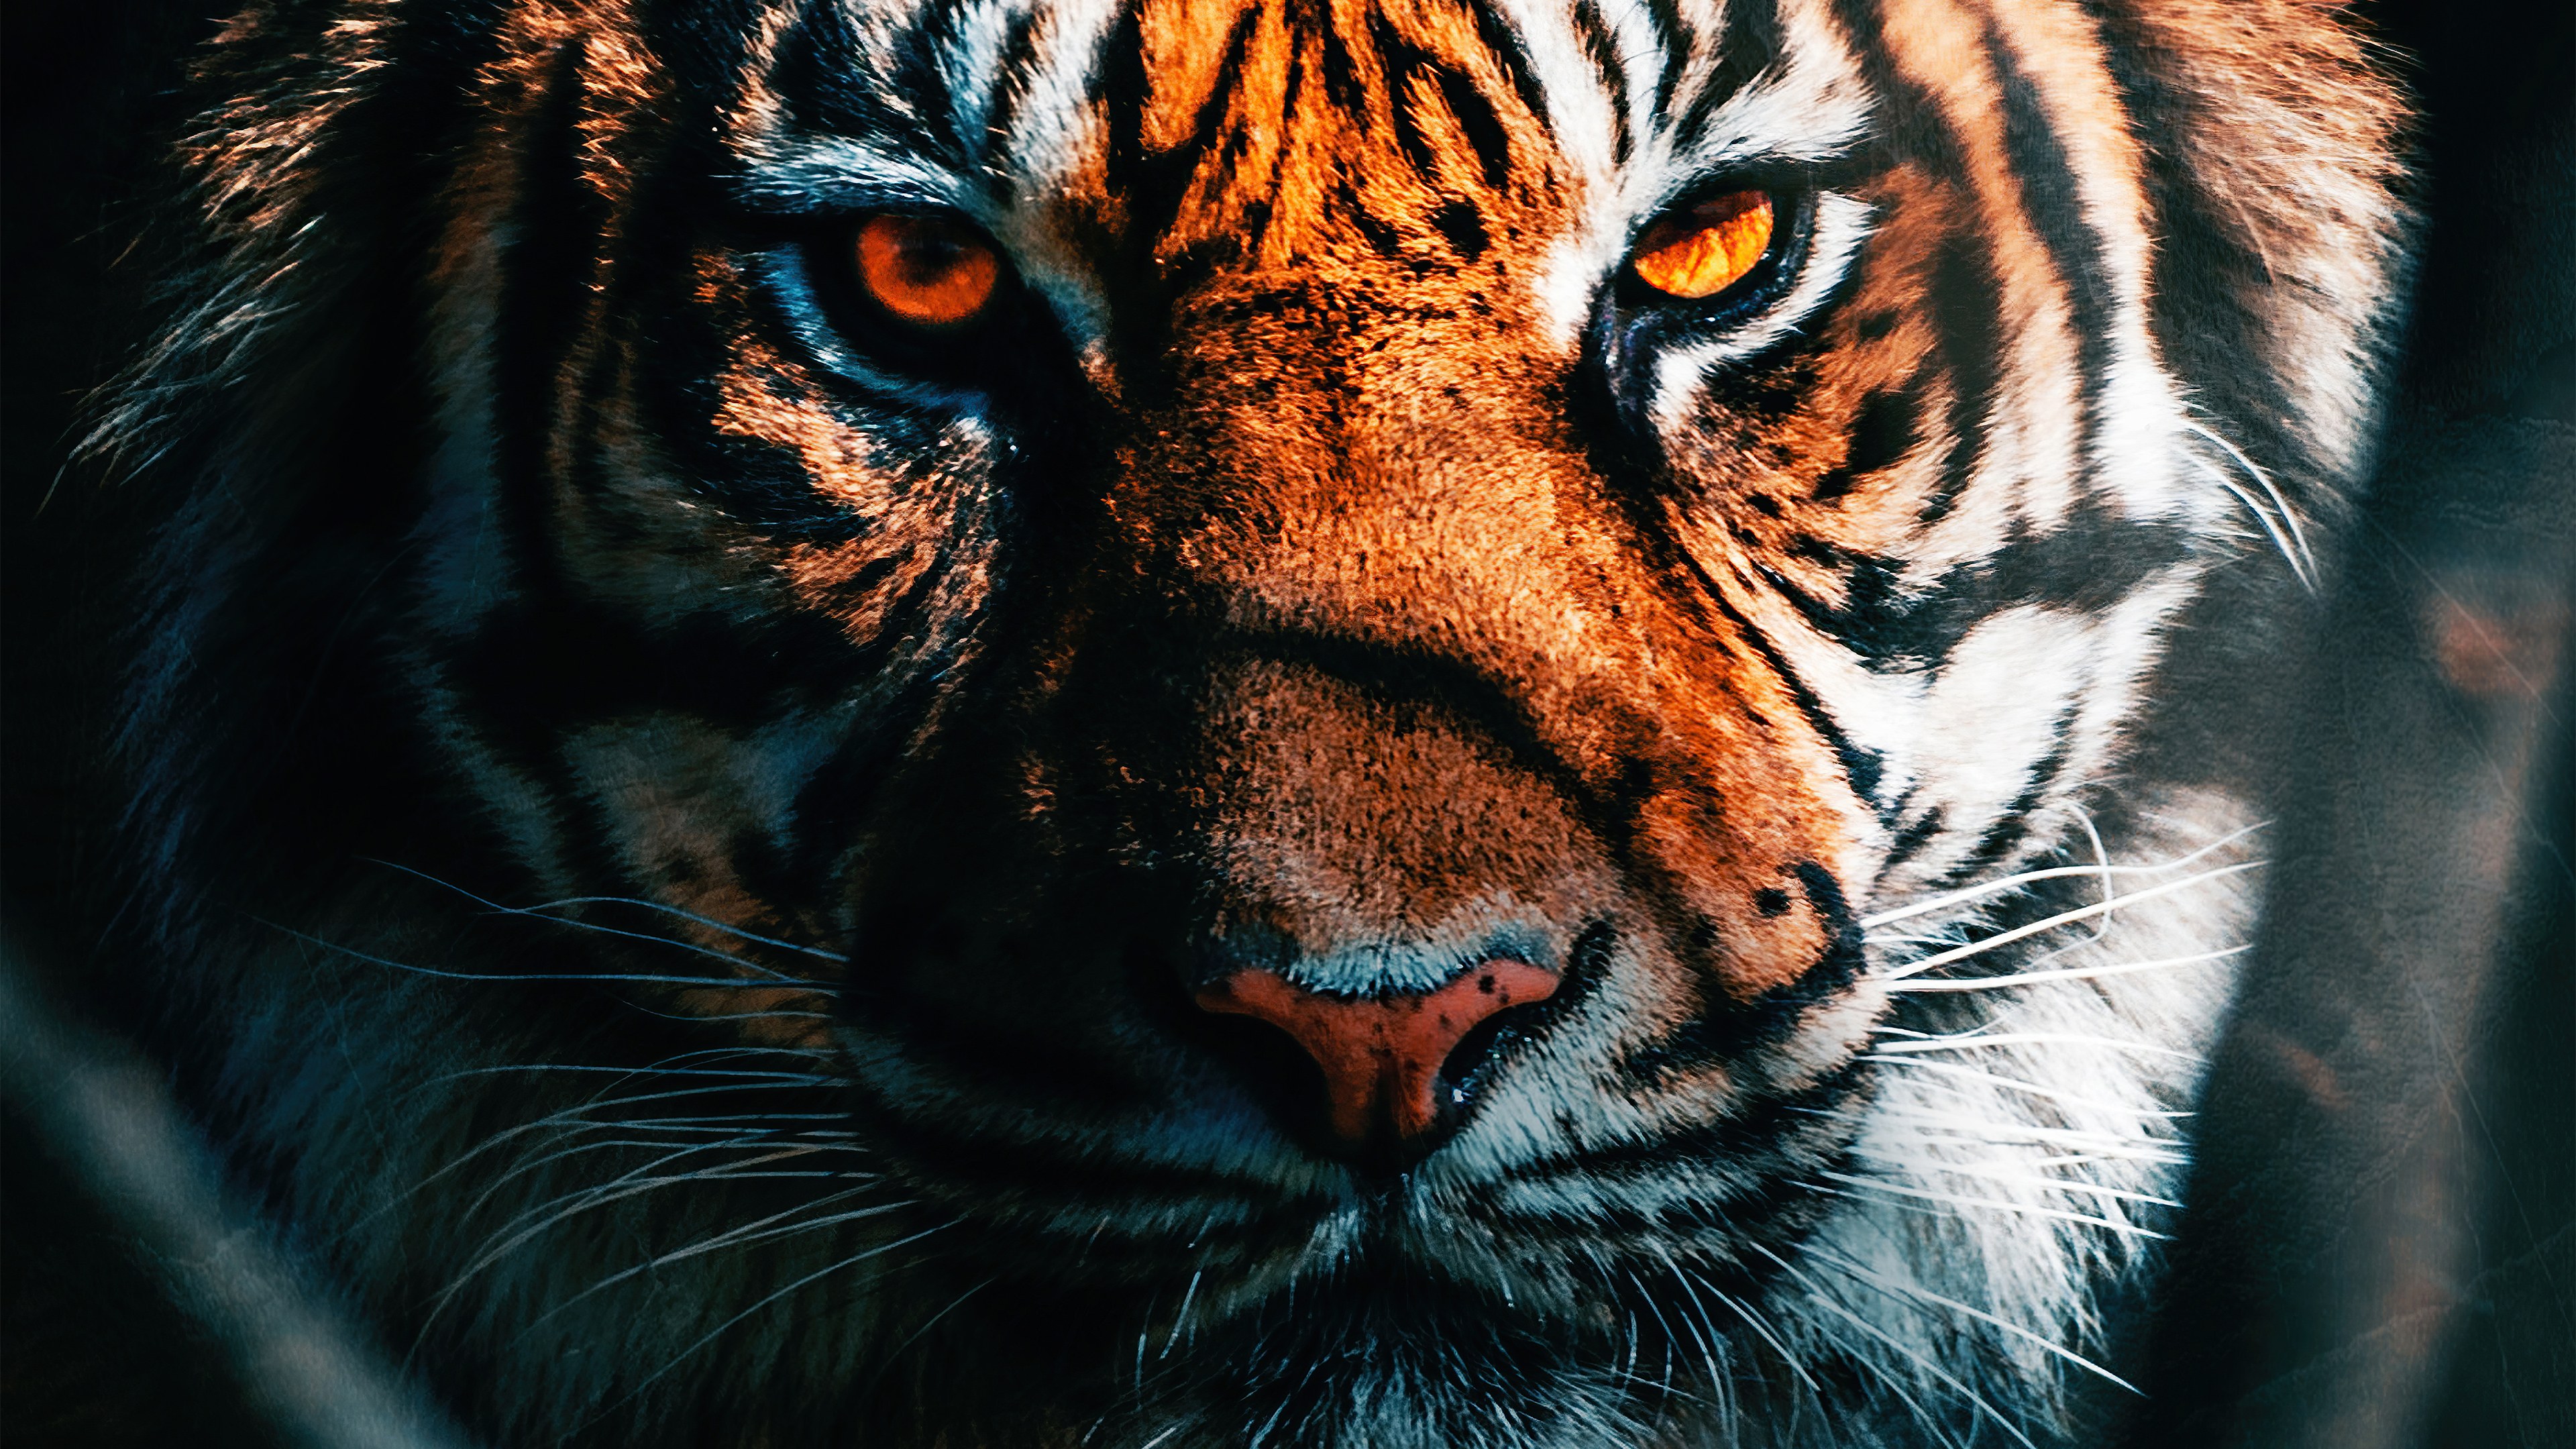 tiger close up 4k 1629139703 - Tiger Close Up 4k - Tiger Close Up wallpapers, Tiger Close Up 4k wallpapers